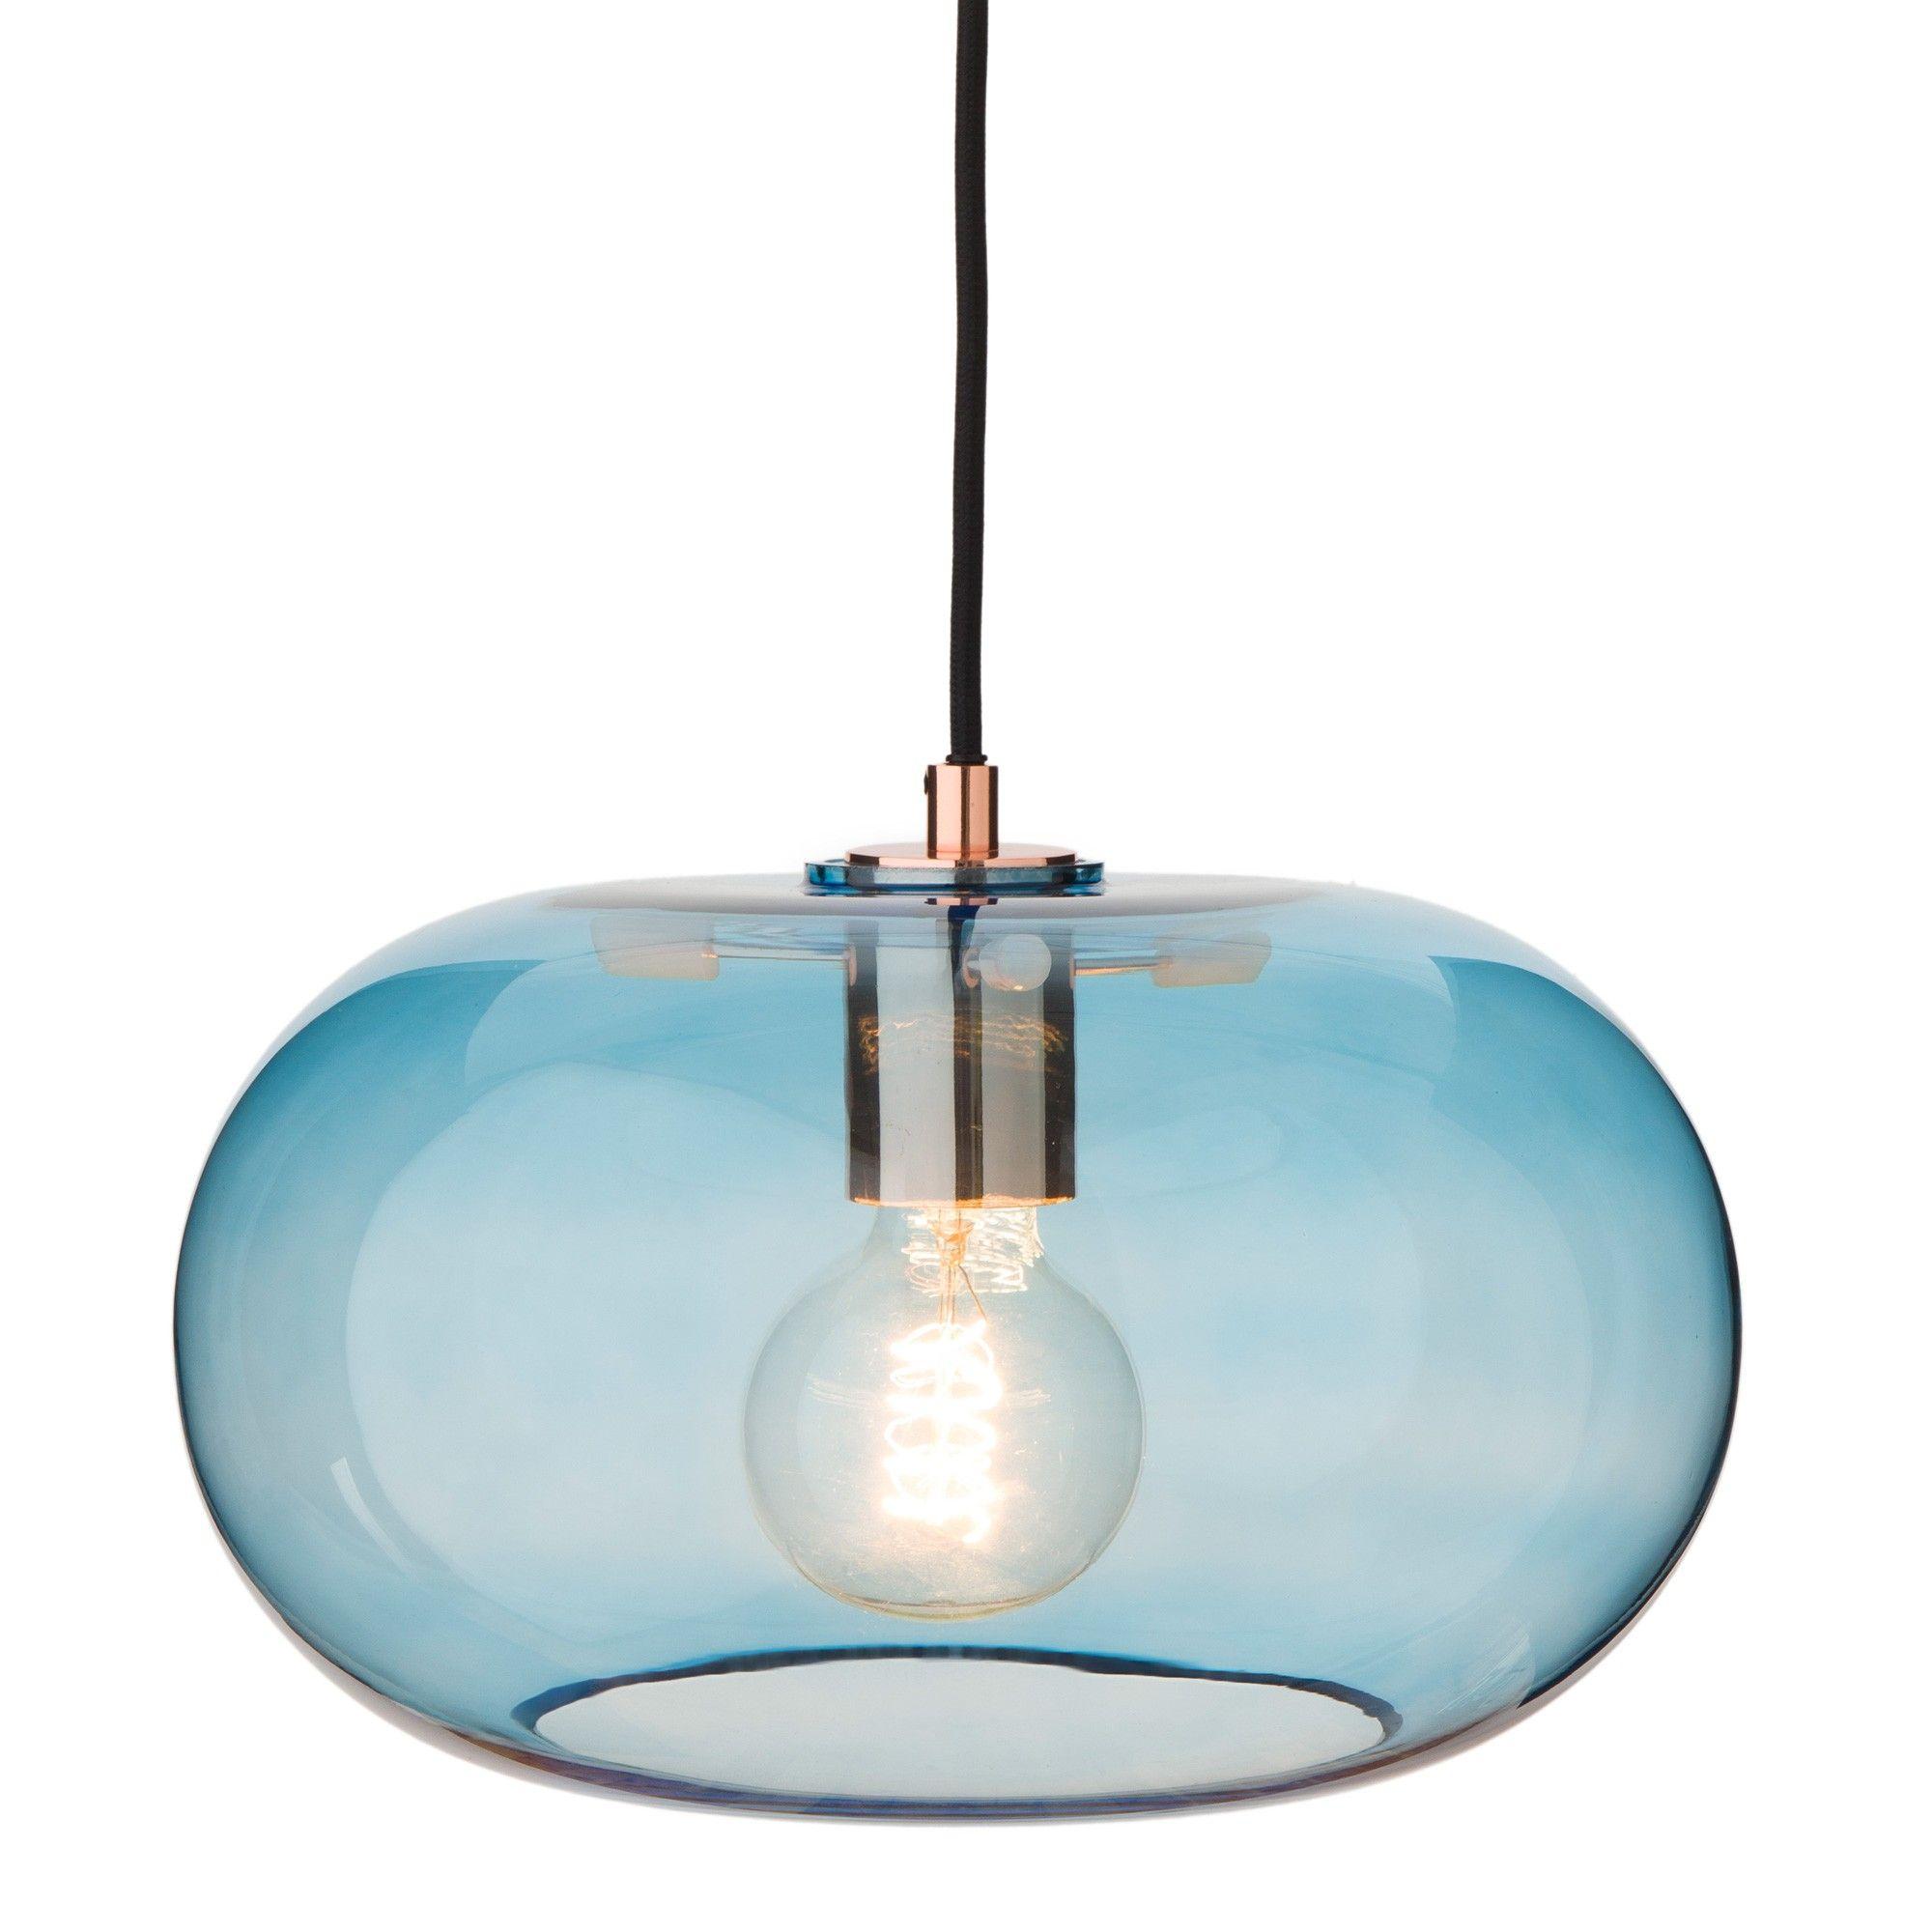 louns lamp curved danish designed glass pendant channelling a 1960s feel lighting. Black Bedroom Furniture Sets. Home Design Ideas